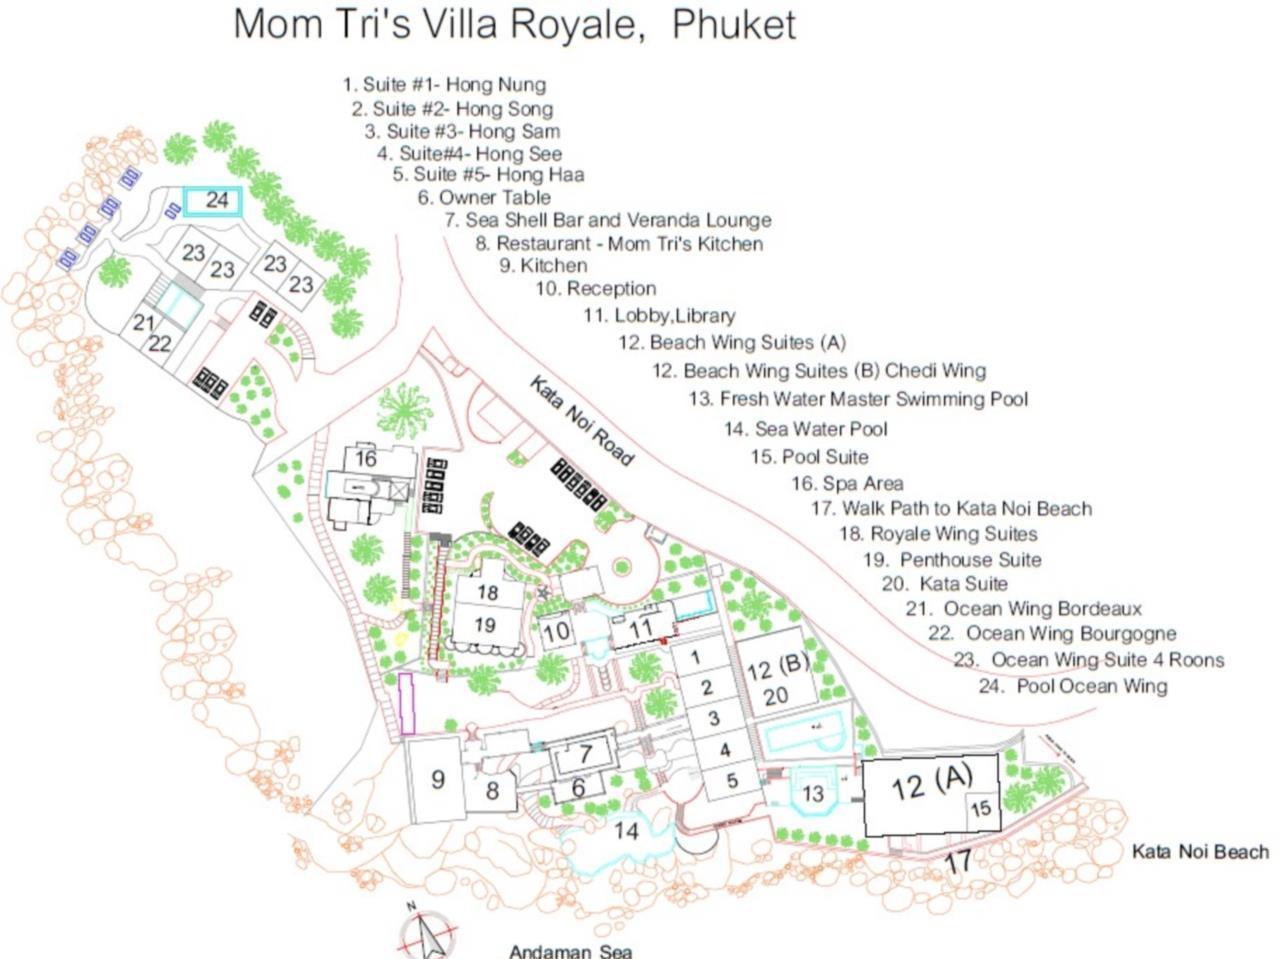 Mom Tris Villa Royale Hotel โรงแรมหม่อมตรี วิลลา รอแยล